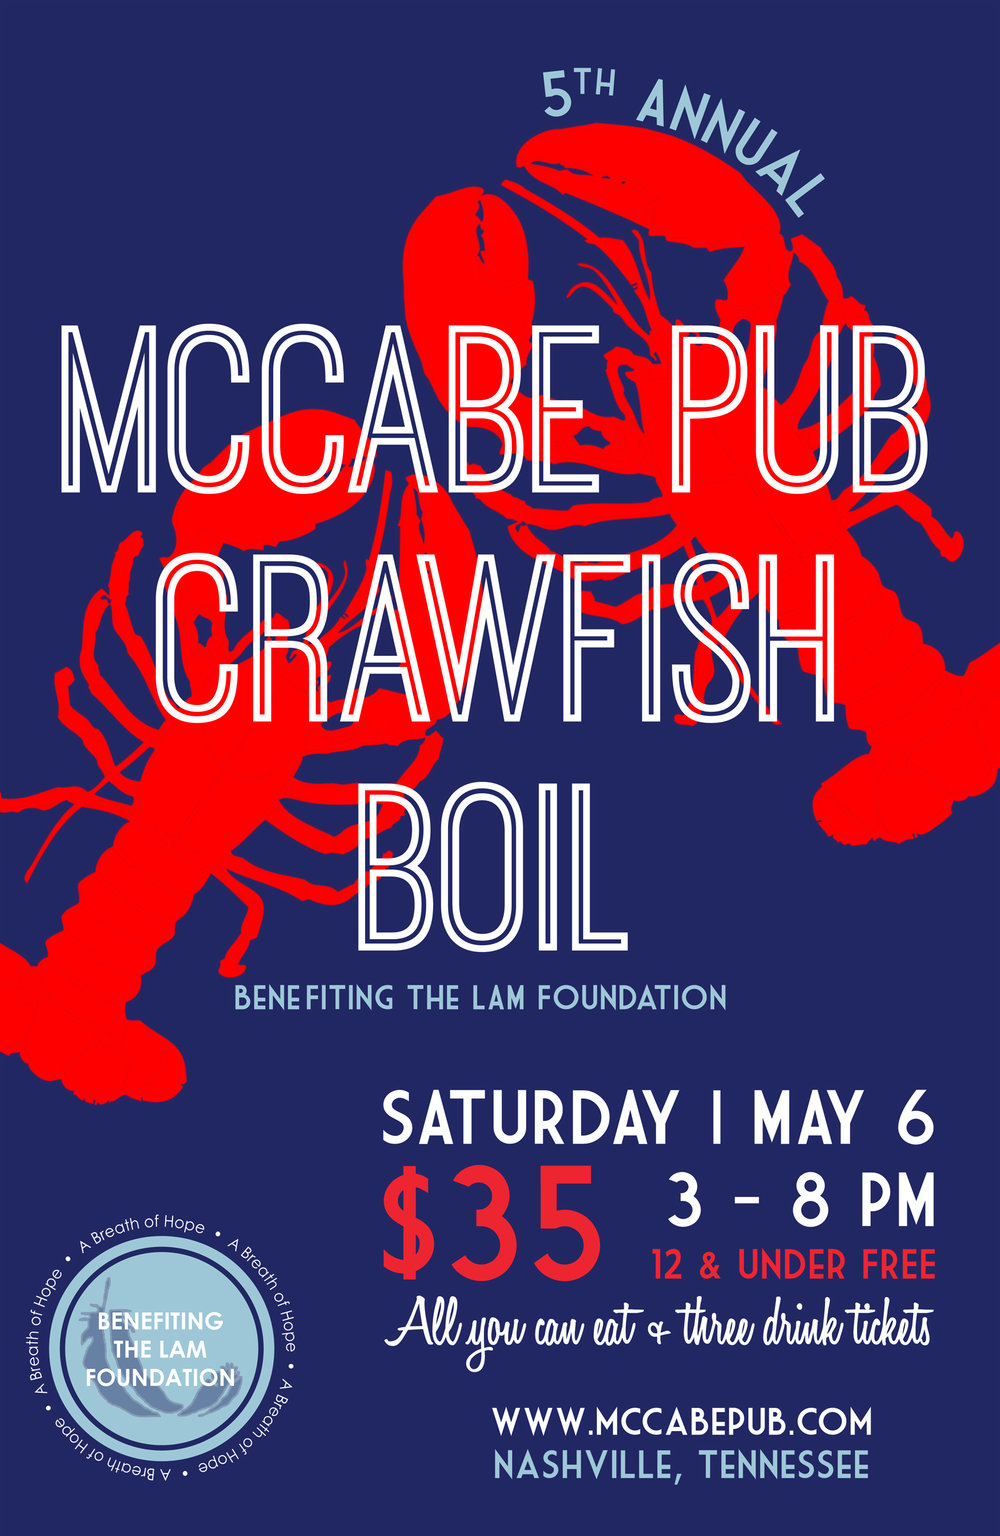 McCabe Pub 5th Annual Crawfish Boil Fundraiser LAM Foundation